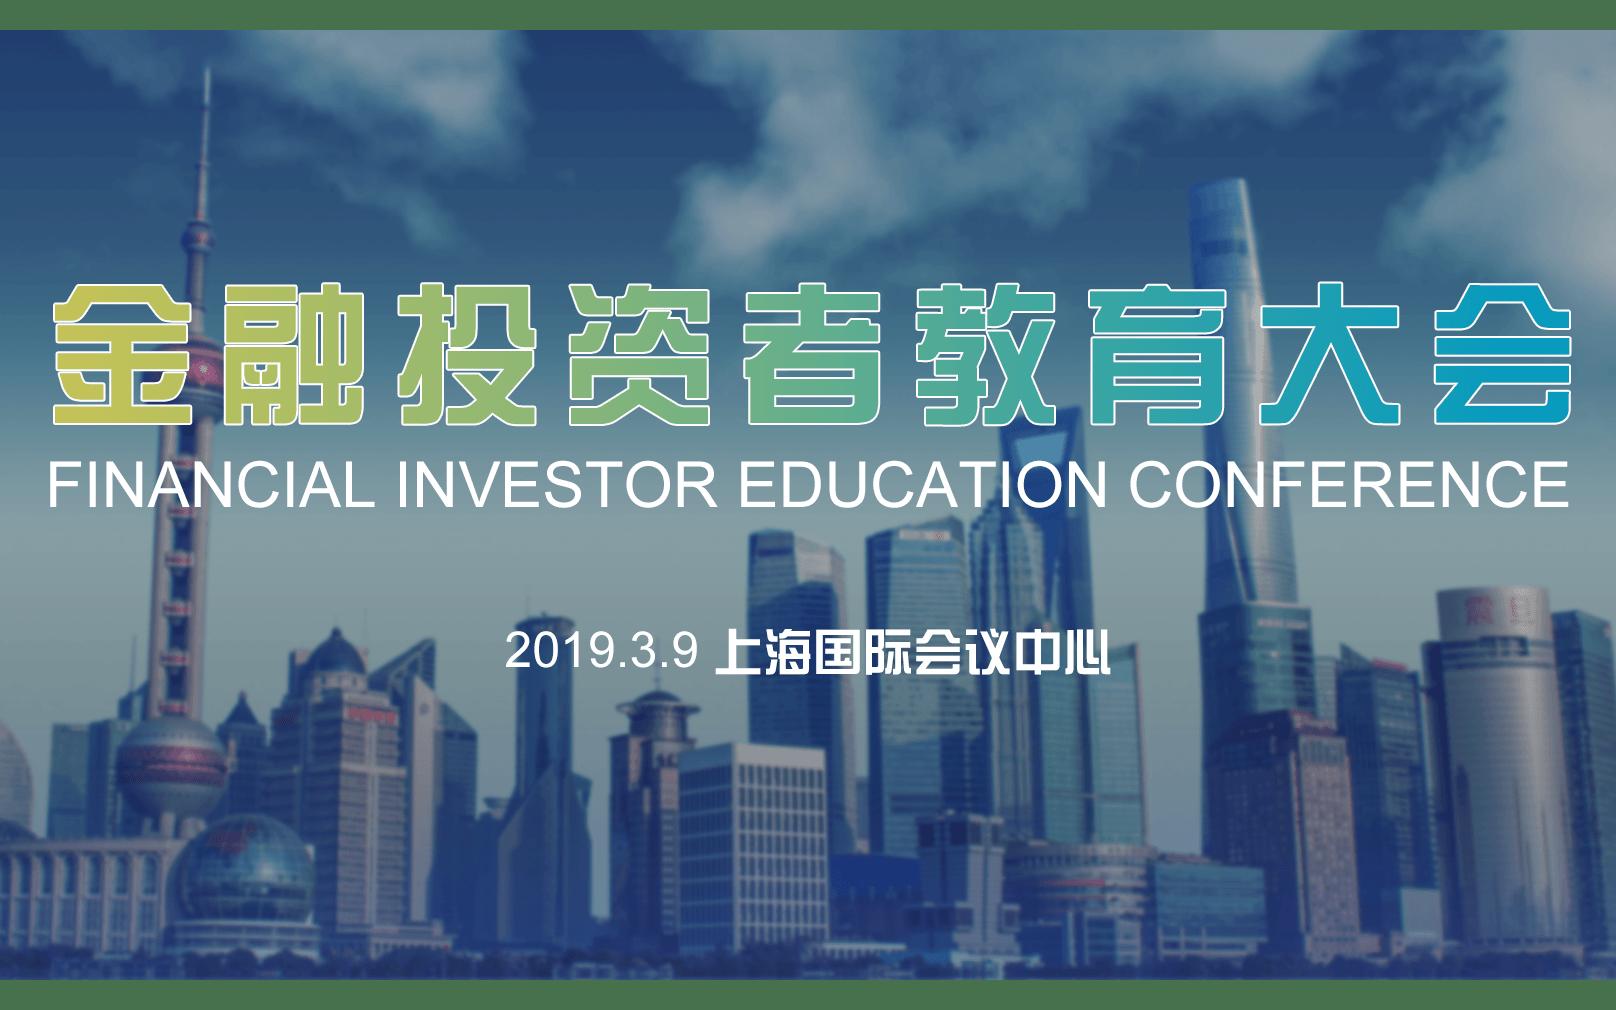 FIEC 2019年金融投资者教育大会(上海)